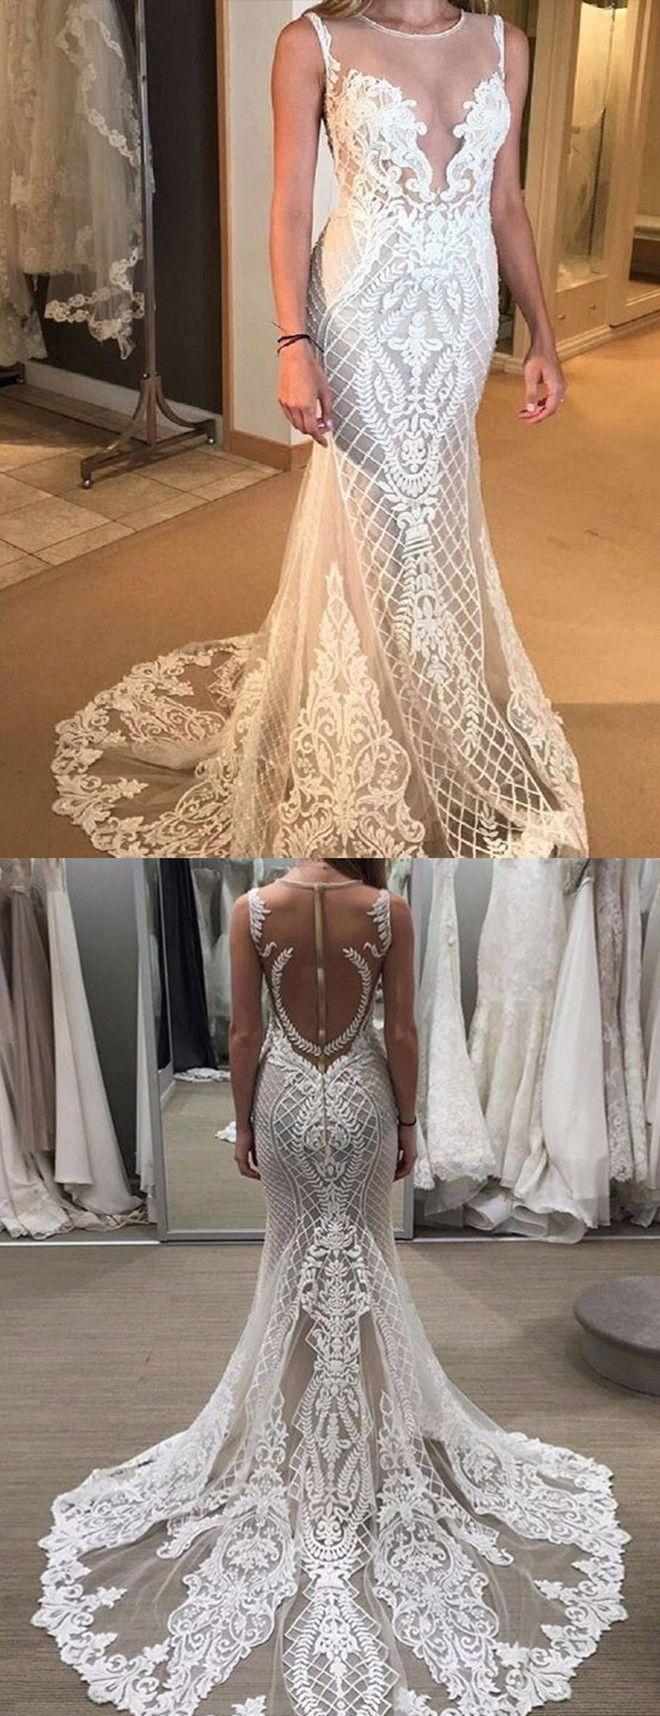 Hochzeit - Fabulous Jewel Sleeveless Sheath Lace Wedding Dress With Detachable Train Illusion Back